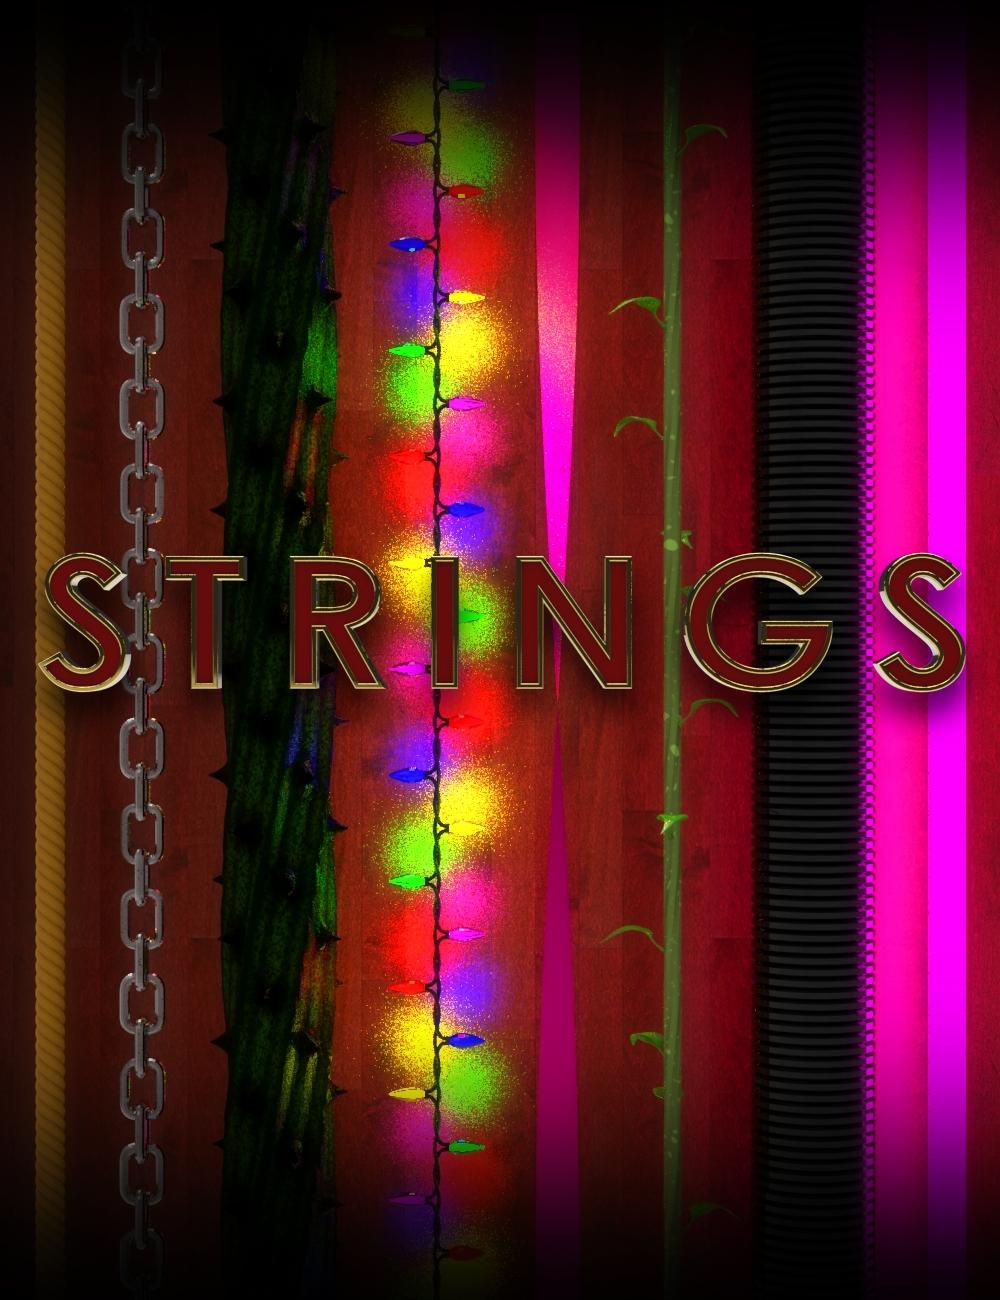 STRINGS by: Mechasar, 3D Models by Daz 3D